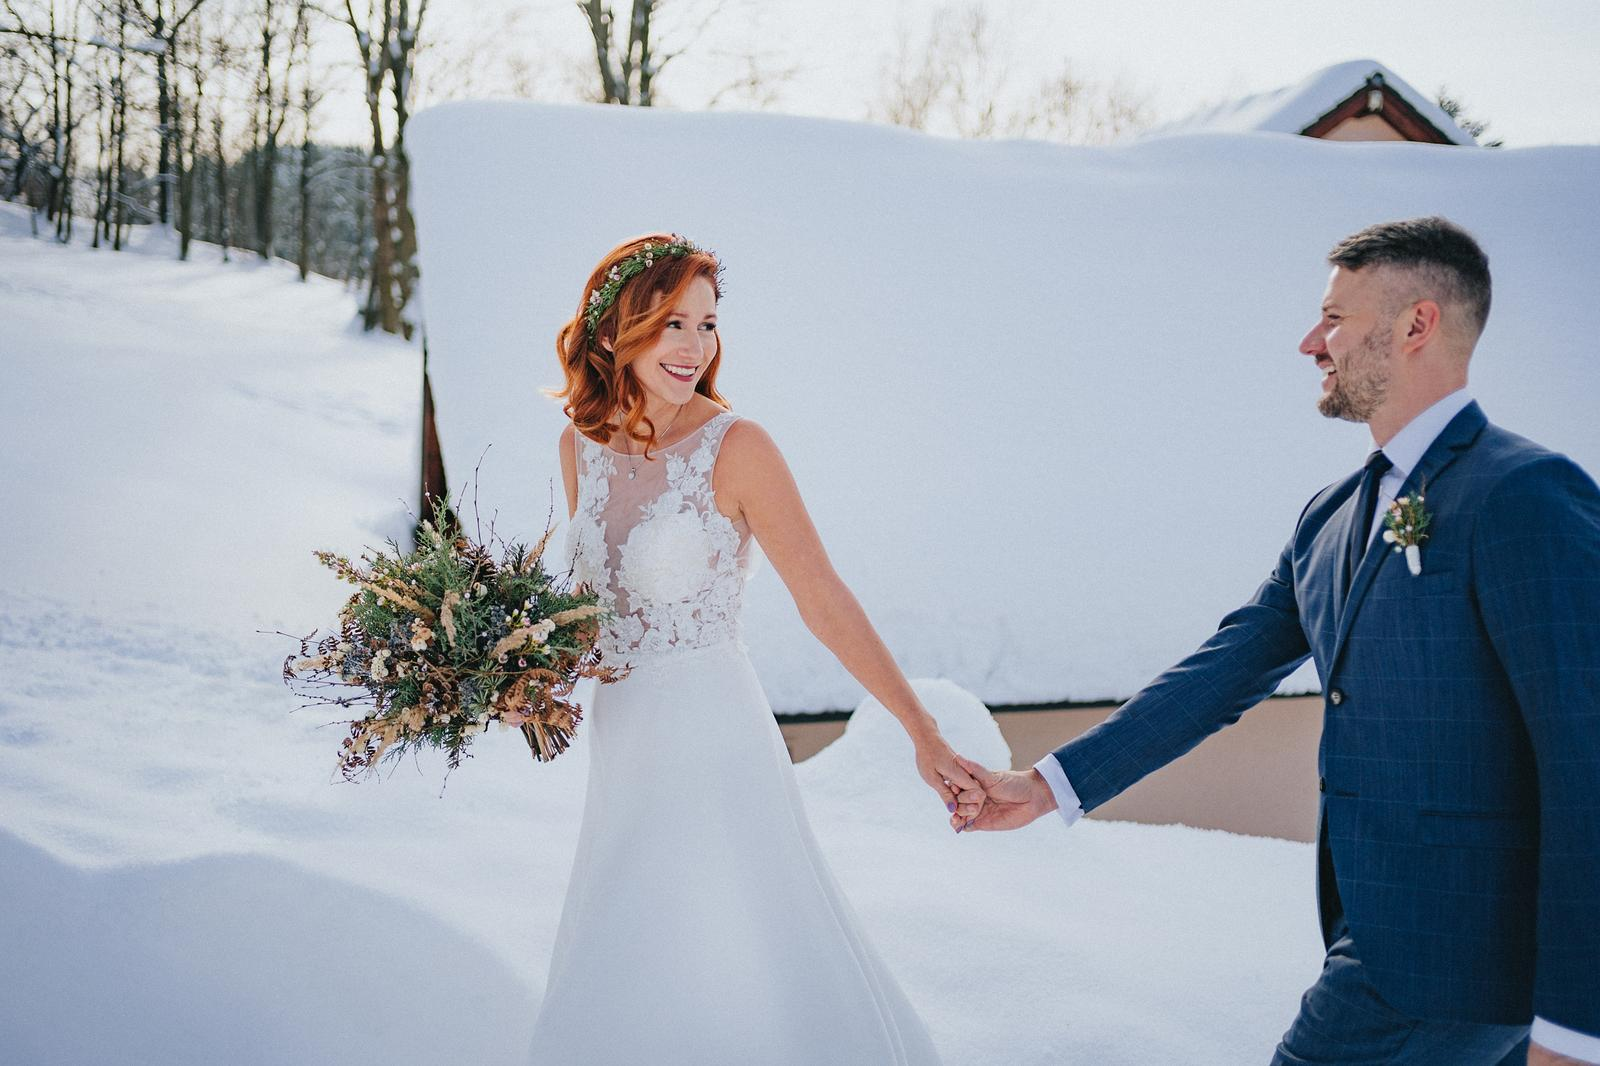 Zimní svatba M&M - Obrázek č. 5